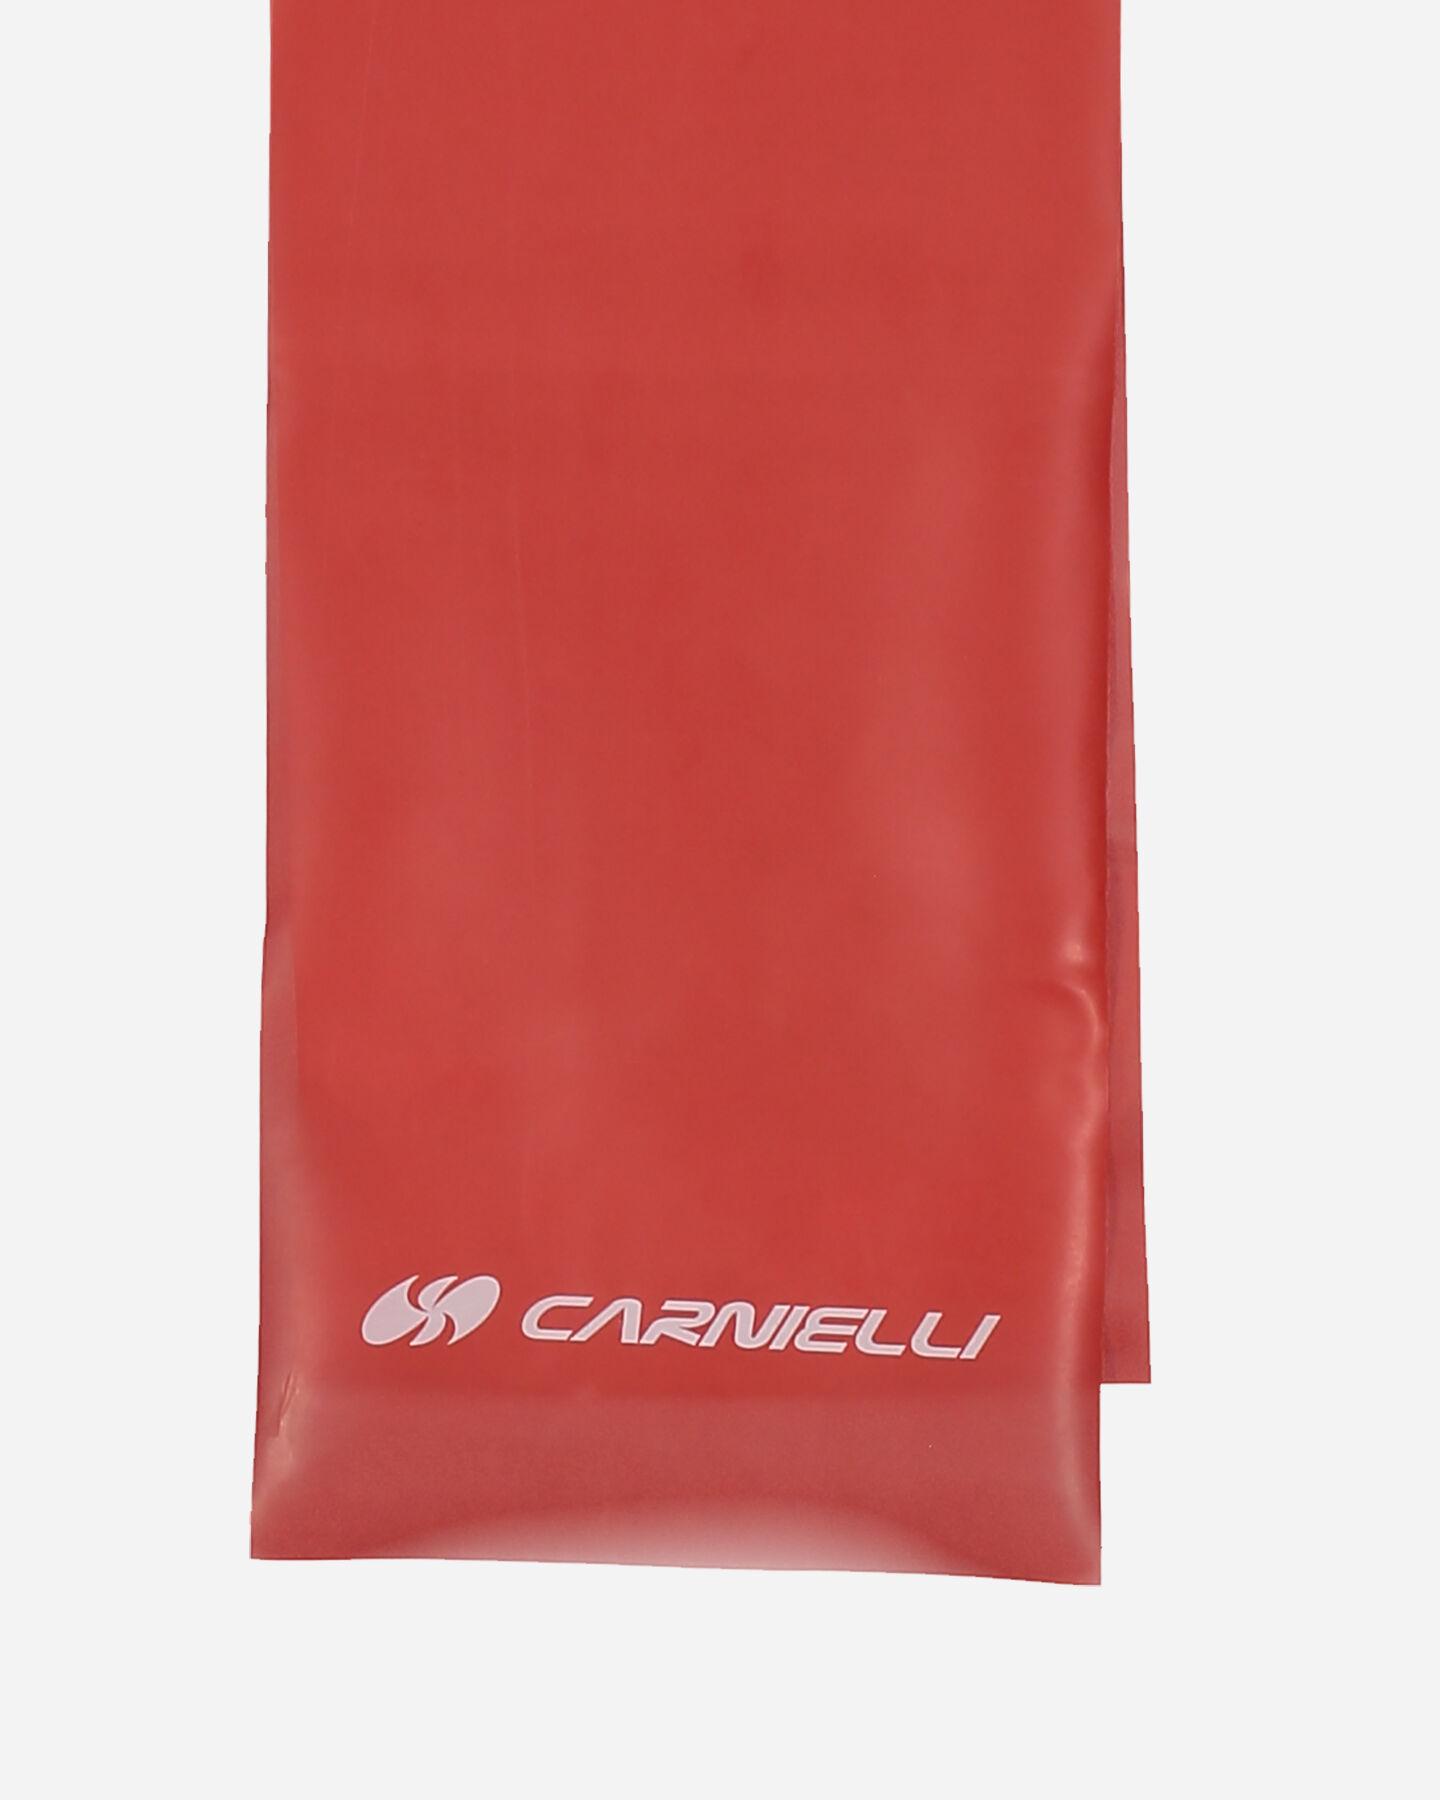 Banda elastica CARNIELLI BANDA ELASTICA 175 CM S1326894|1|UNI scatto 1